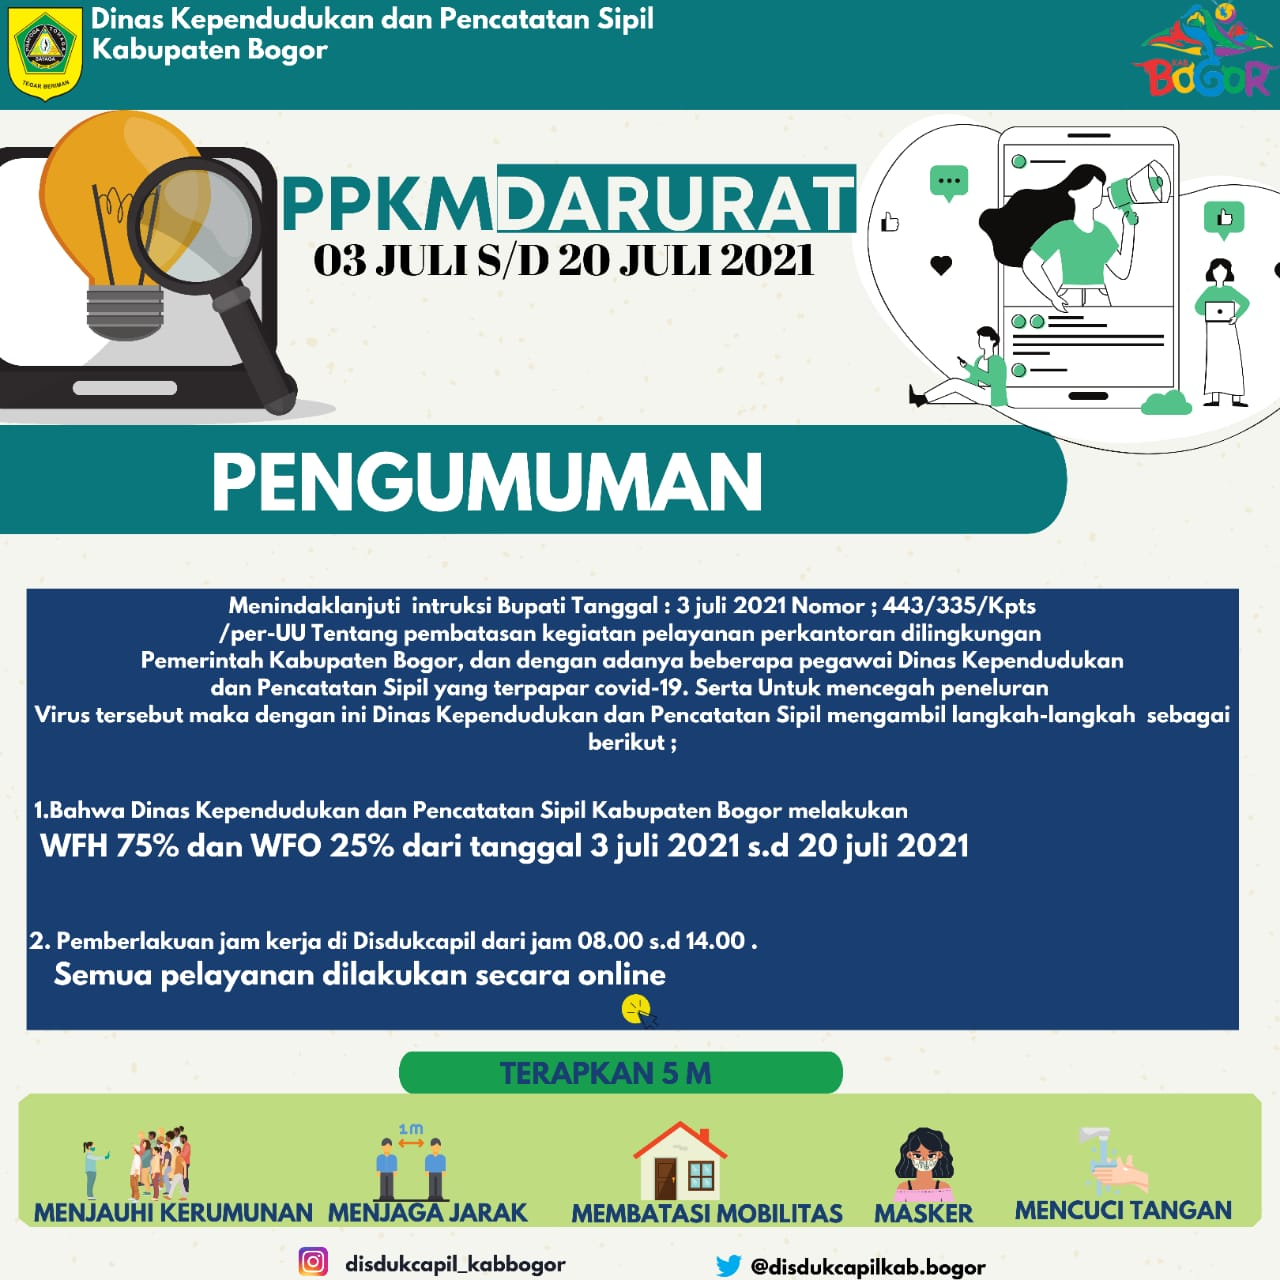 Informasi PPKM DARURAT Disdukcapil Kabupaten Bogor